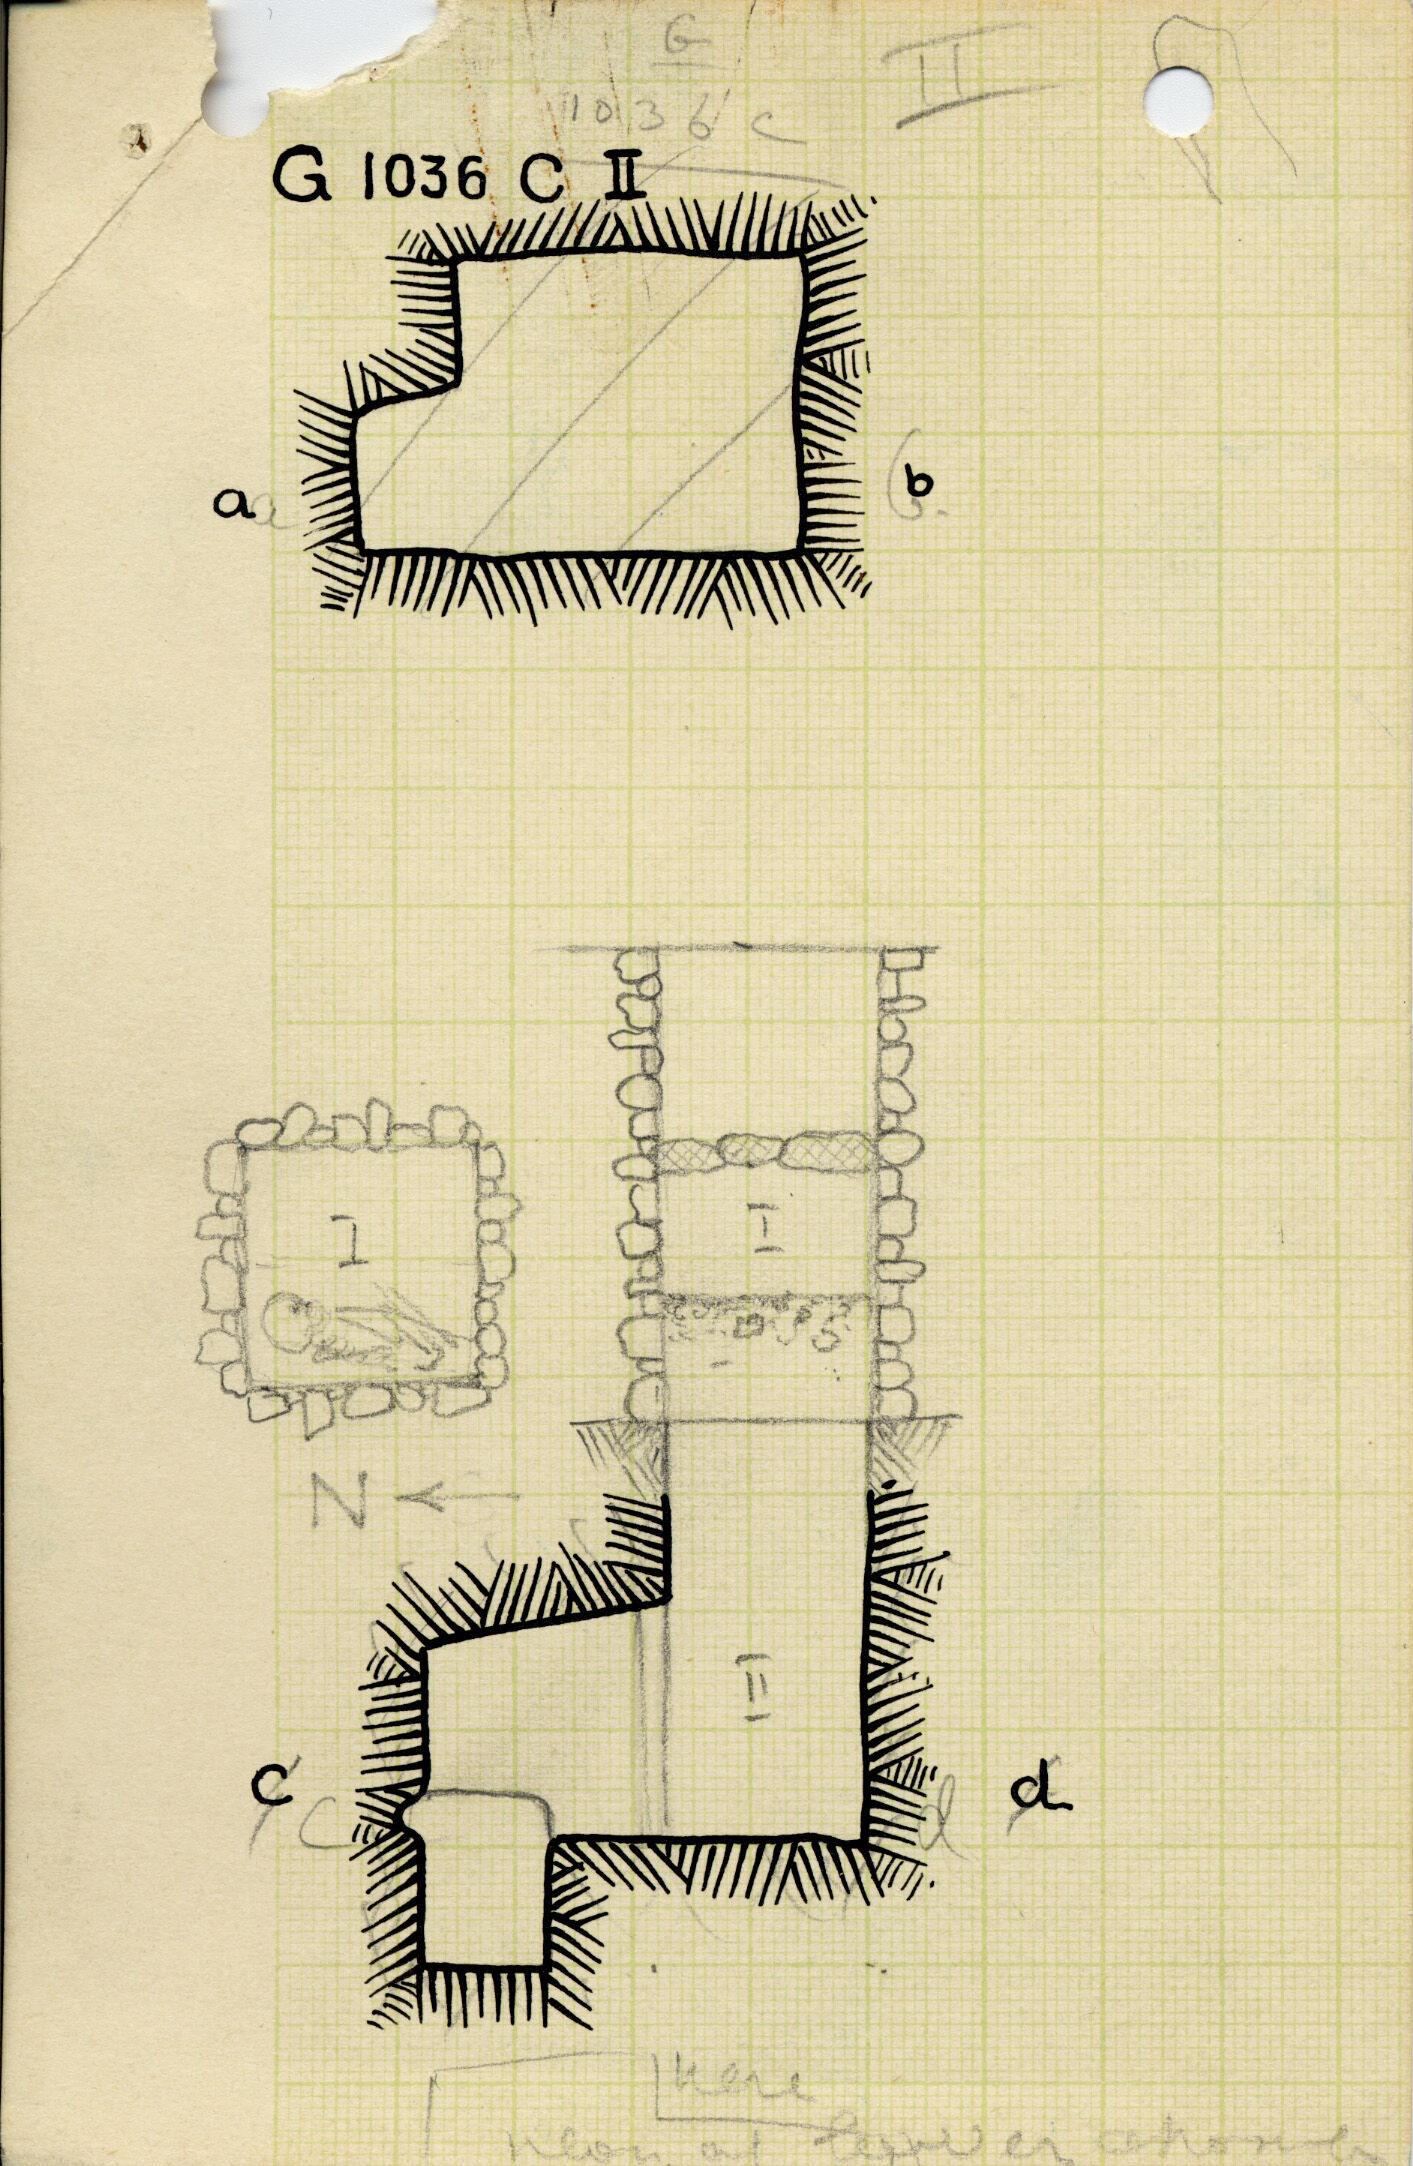 Maps and plans: G 1036, Shaft C (I & II)